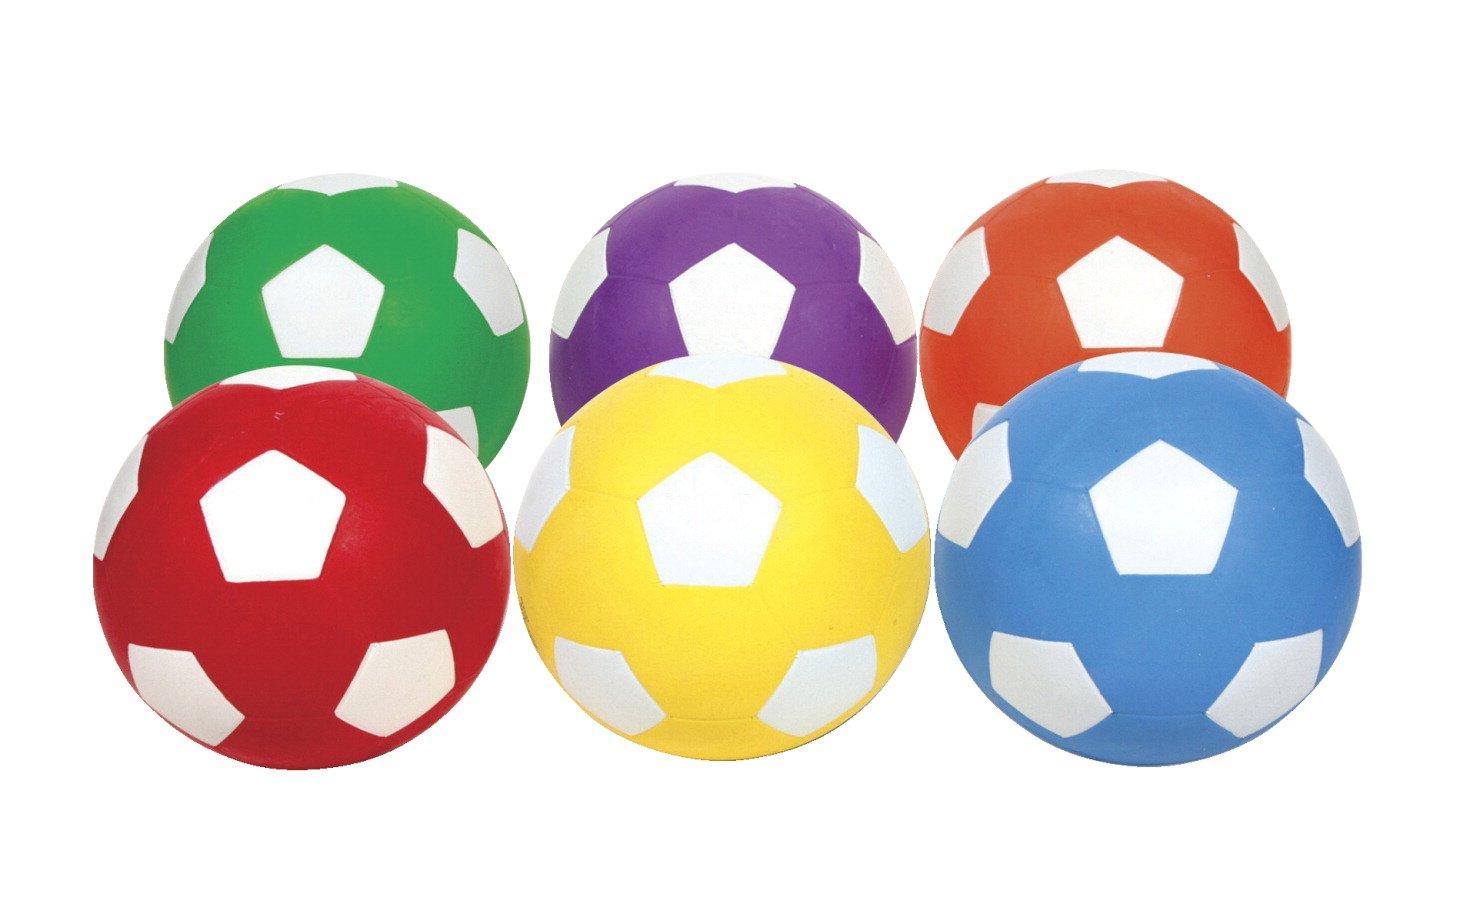 School Smart Size 4 Soccer Balls, Assorted Colors, Set of 6